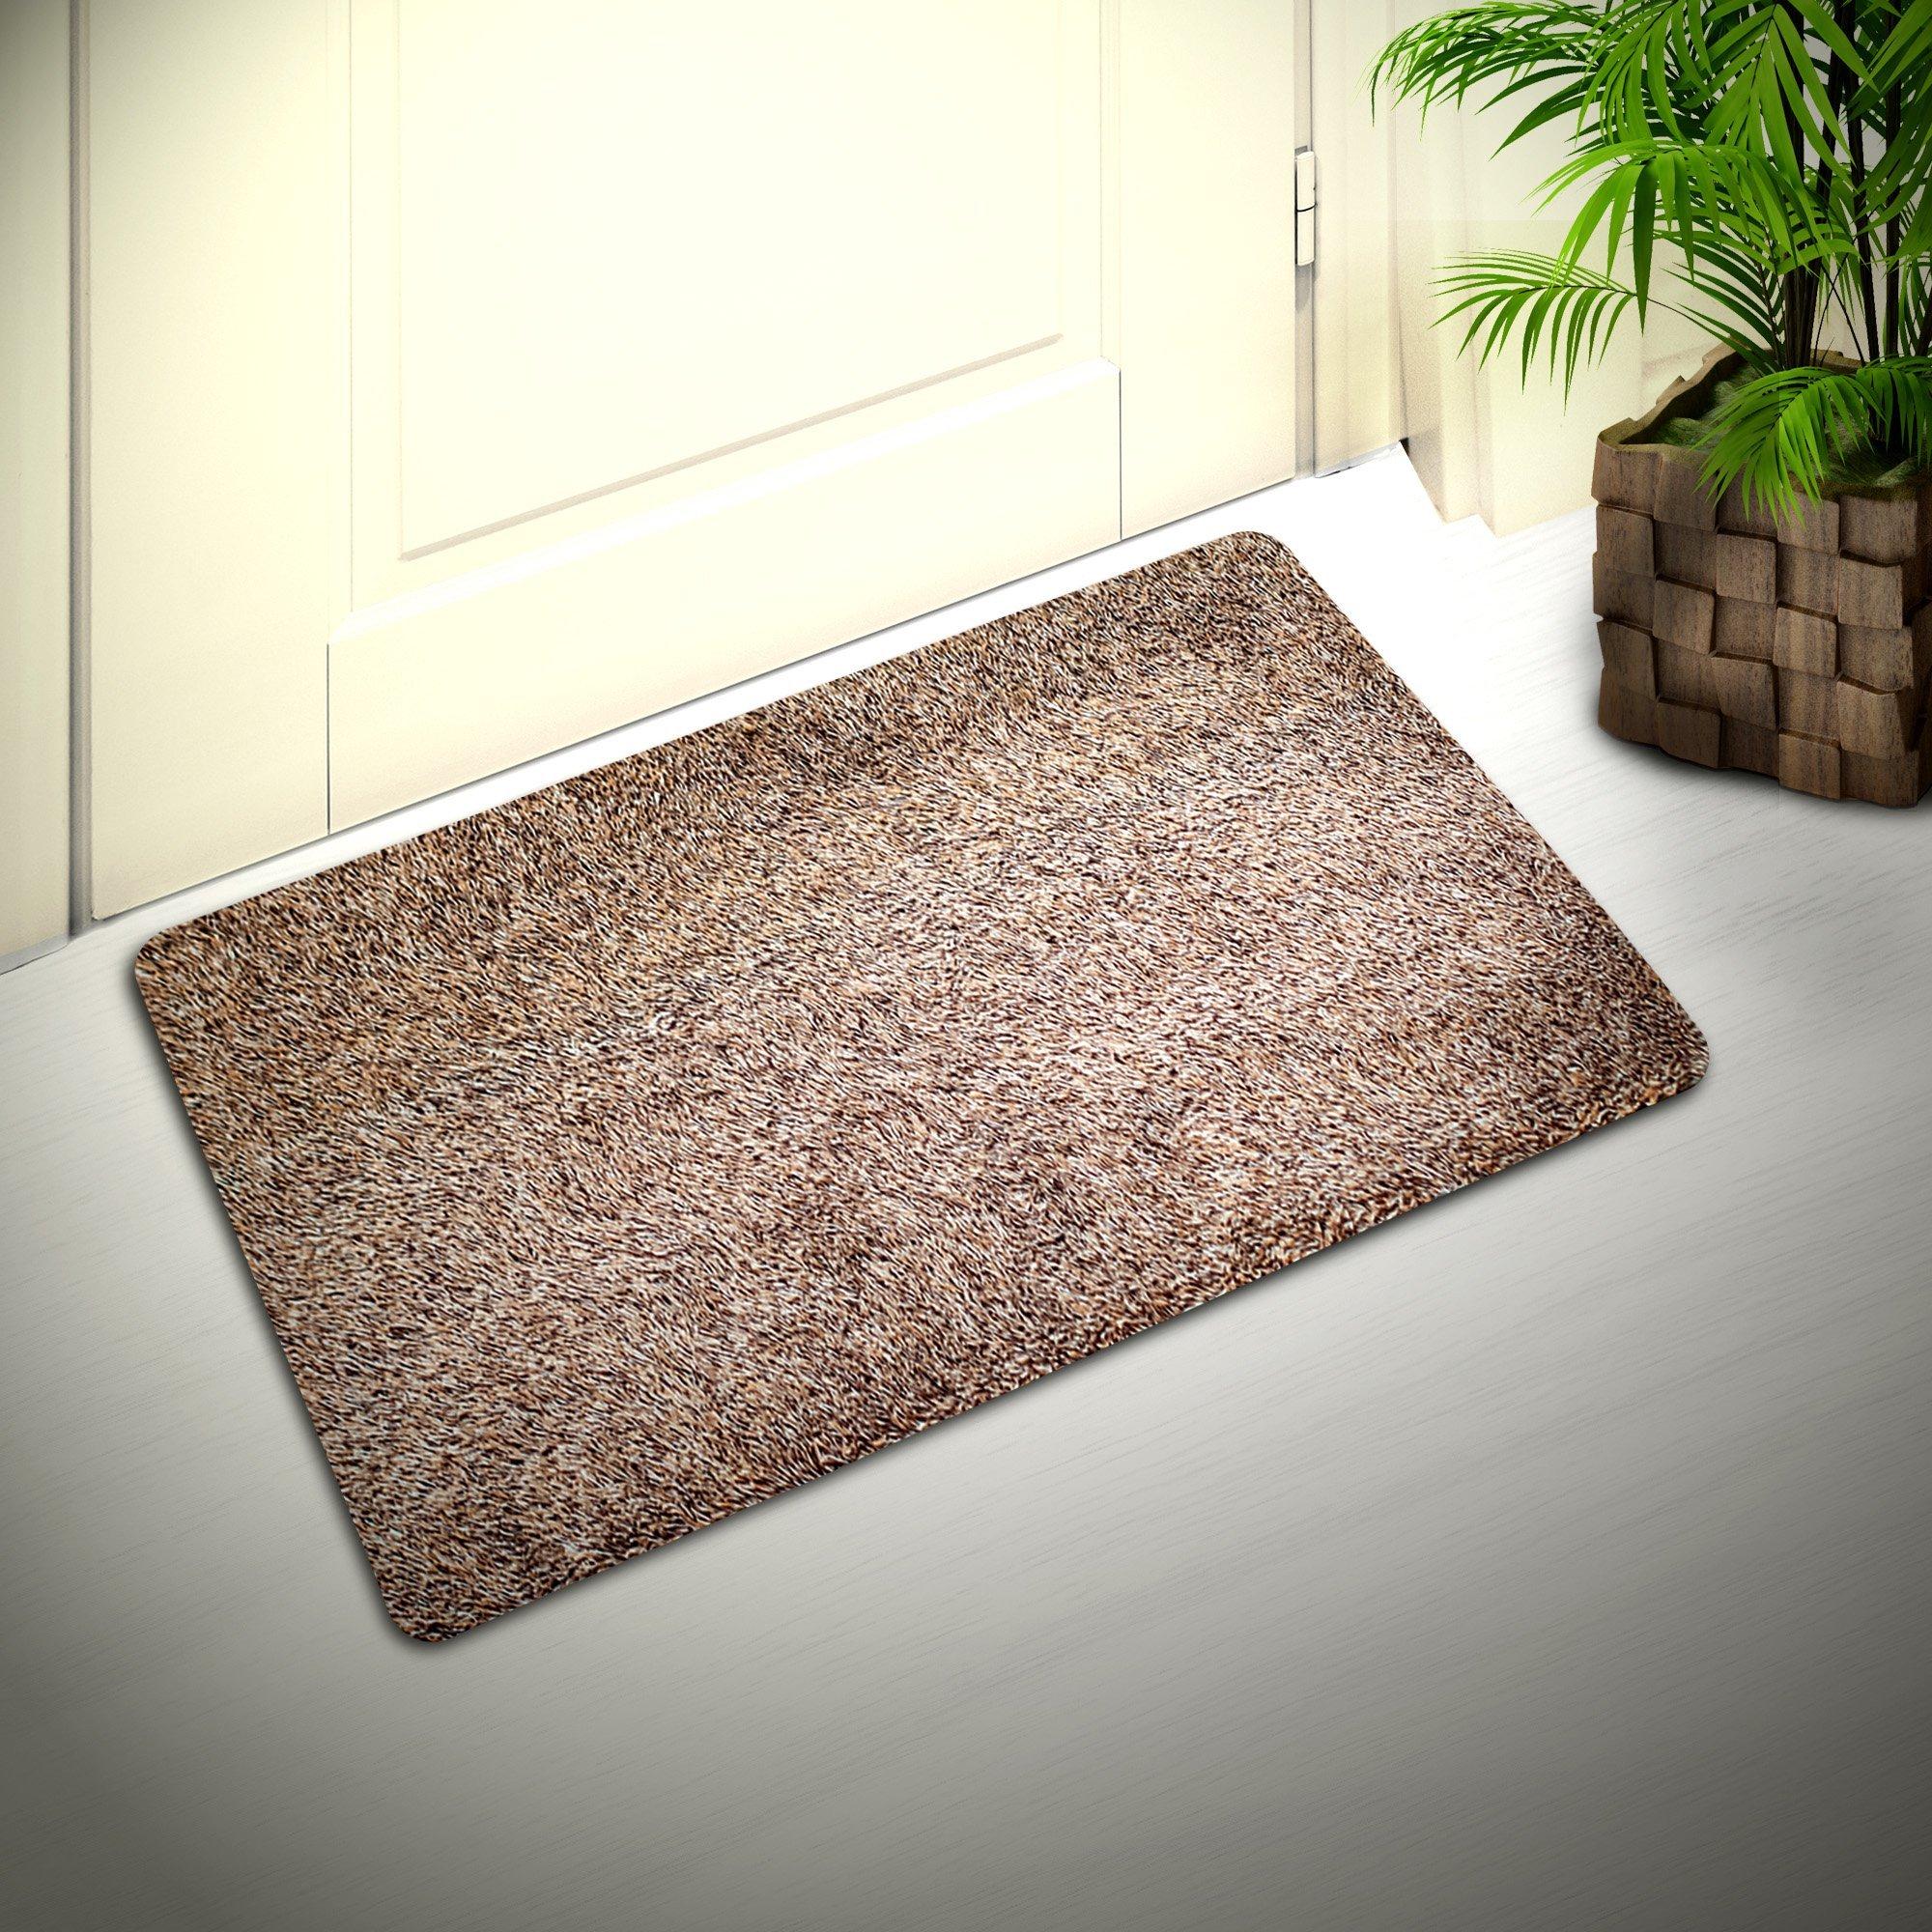 Cozy Corner Inside or Outside Doormat, Shoes Scraper for Front Door Mat, Outdoor Indoor Rug for Patio Kitchen Bathroom, Absorbent Cotton, Microfiber Carpet with Non-Slip Rubber Backing in Brown